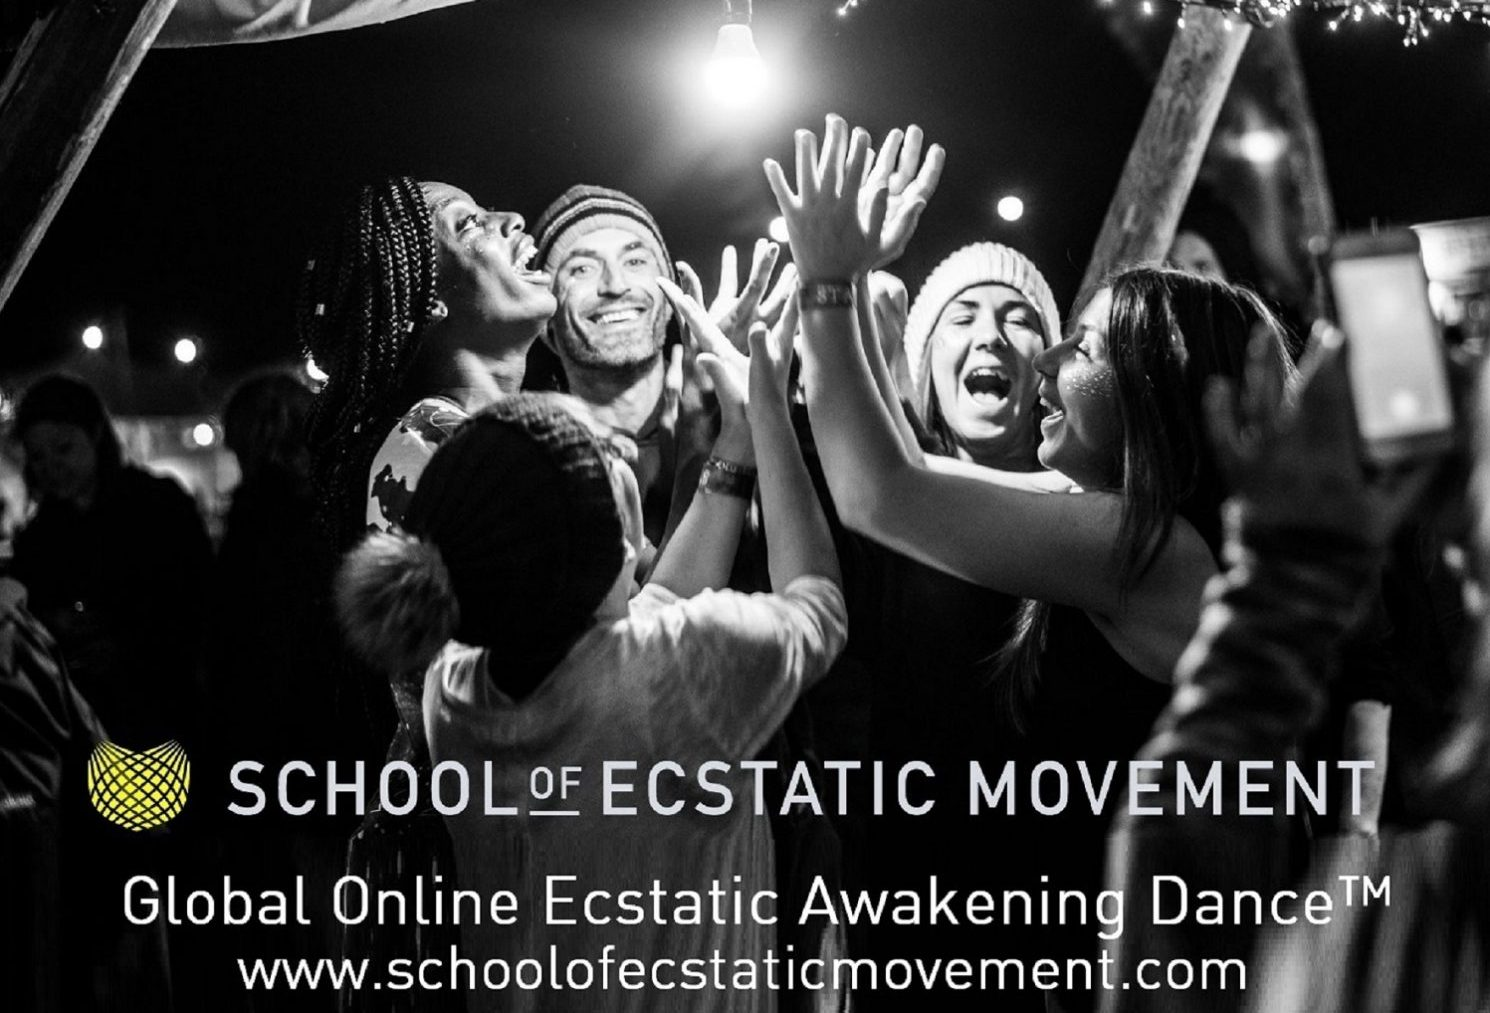 Global Ecstatic Awakening Dance™